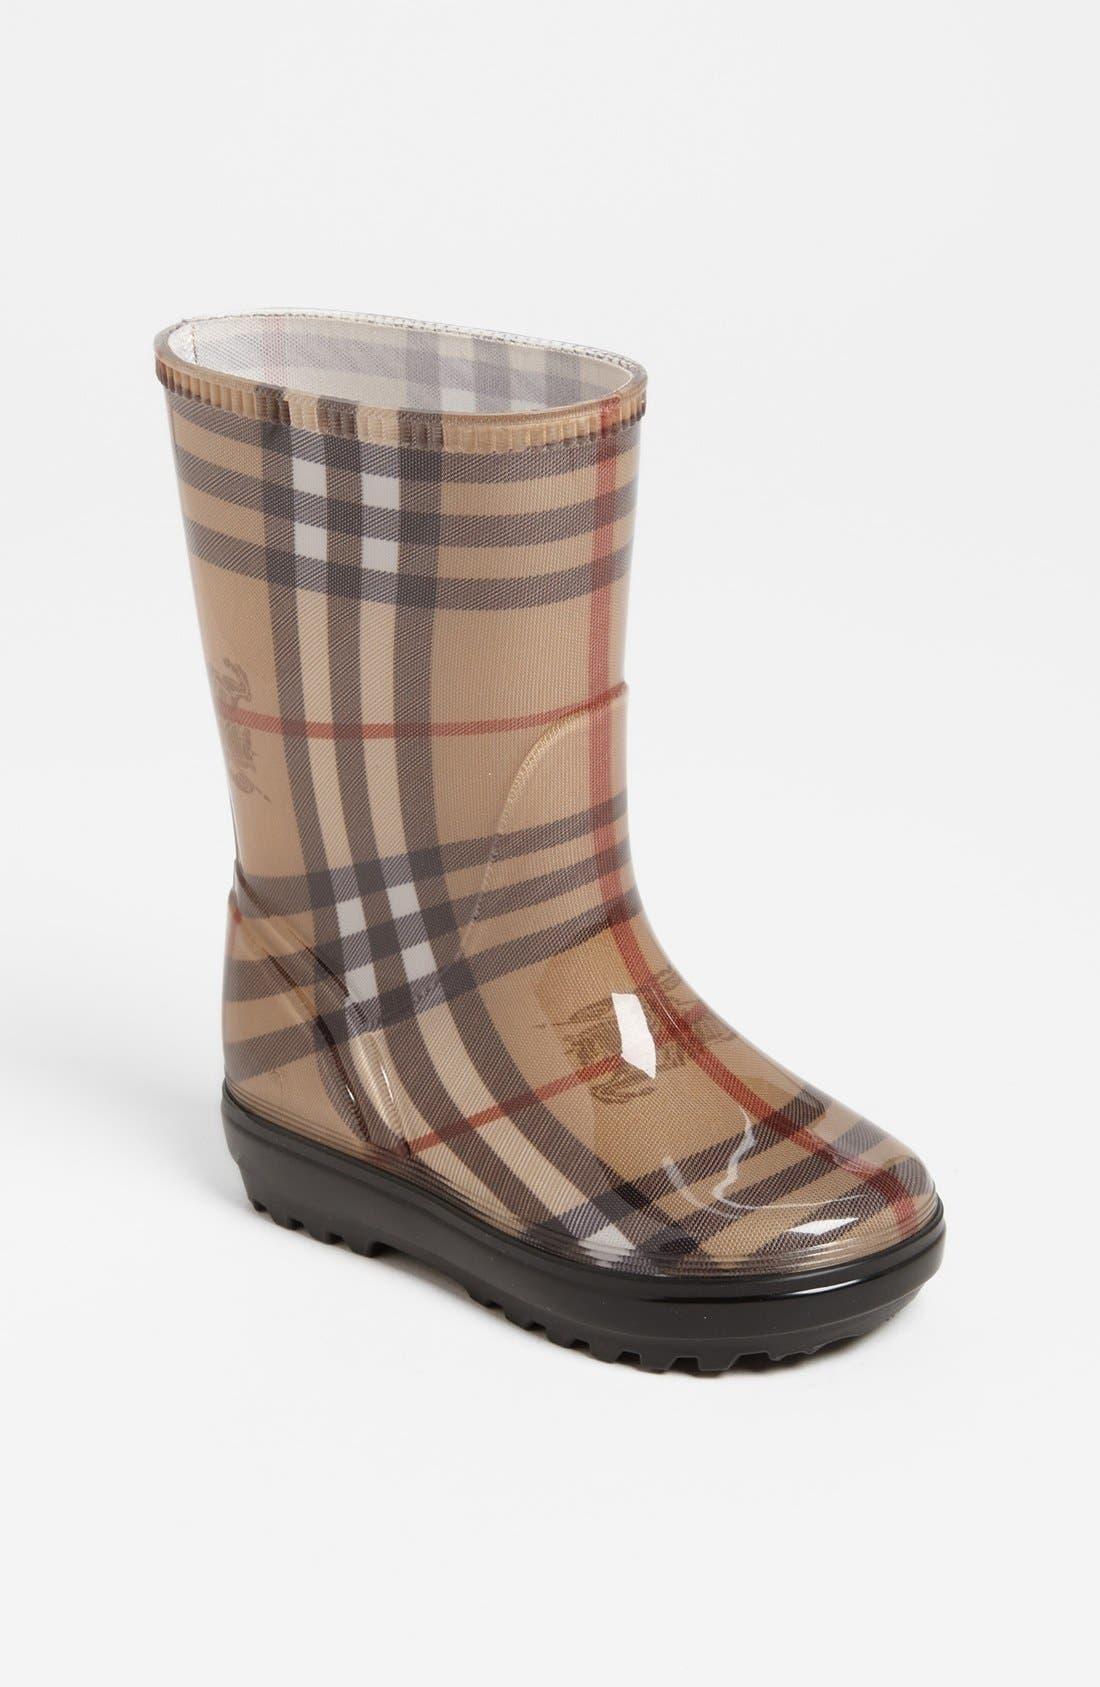 Alternate Image 1 Selected - Burberry 'Niles' Rain Boot (Walker, Toddler, Little Kid & Big Kid)